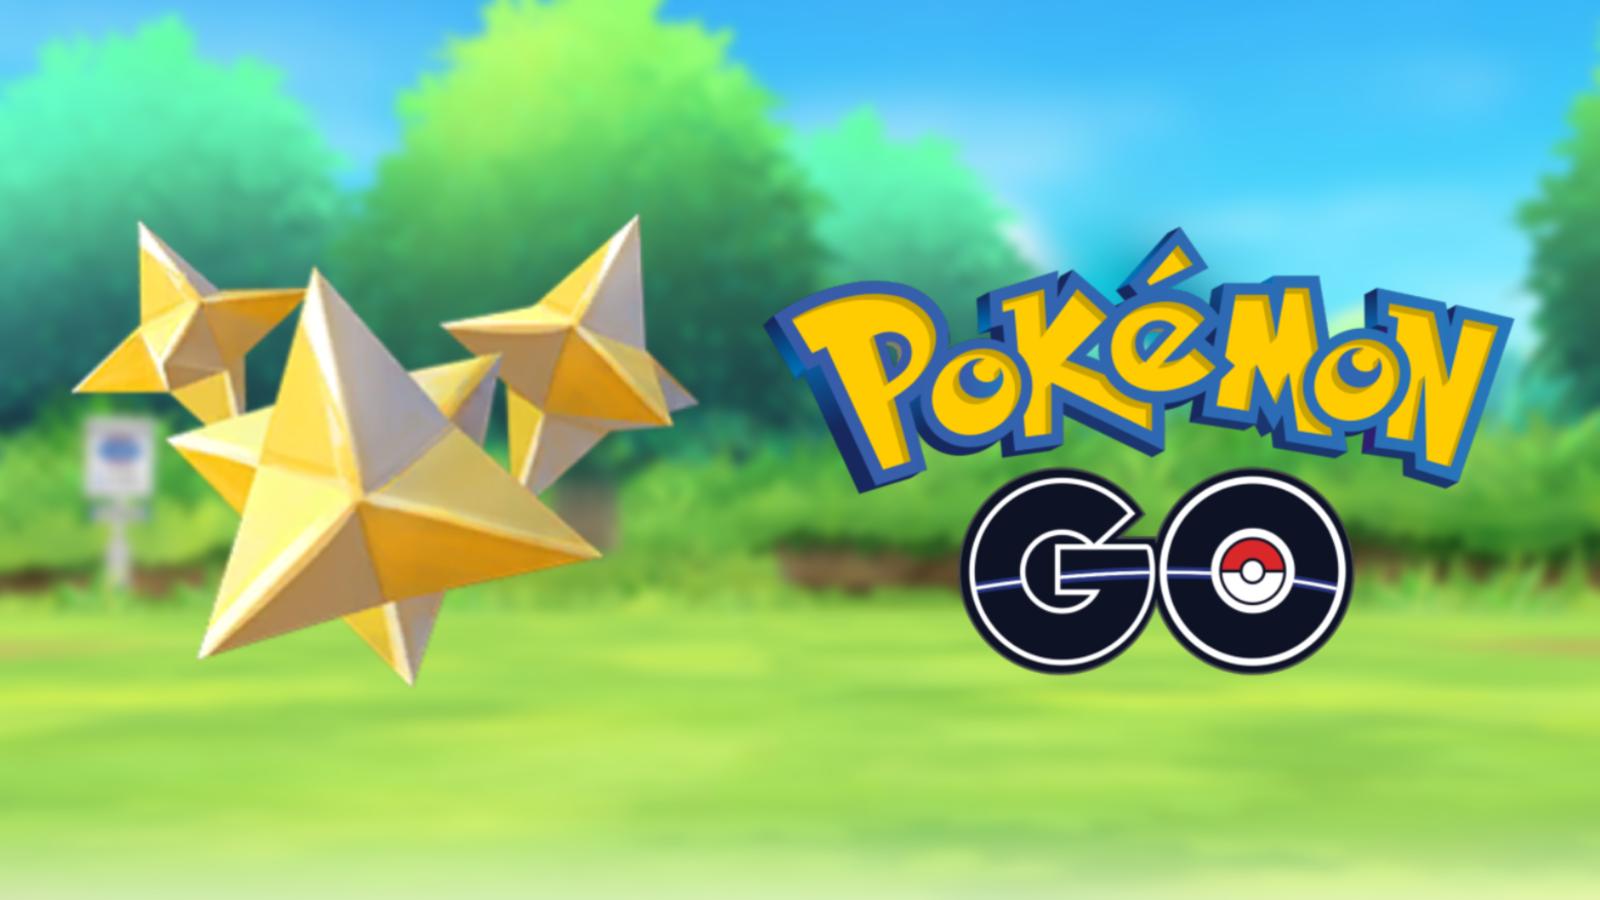 Pokemon GO revives